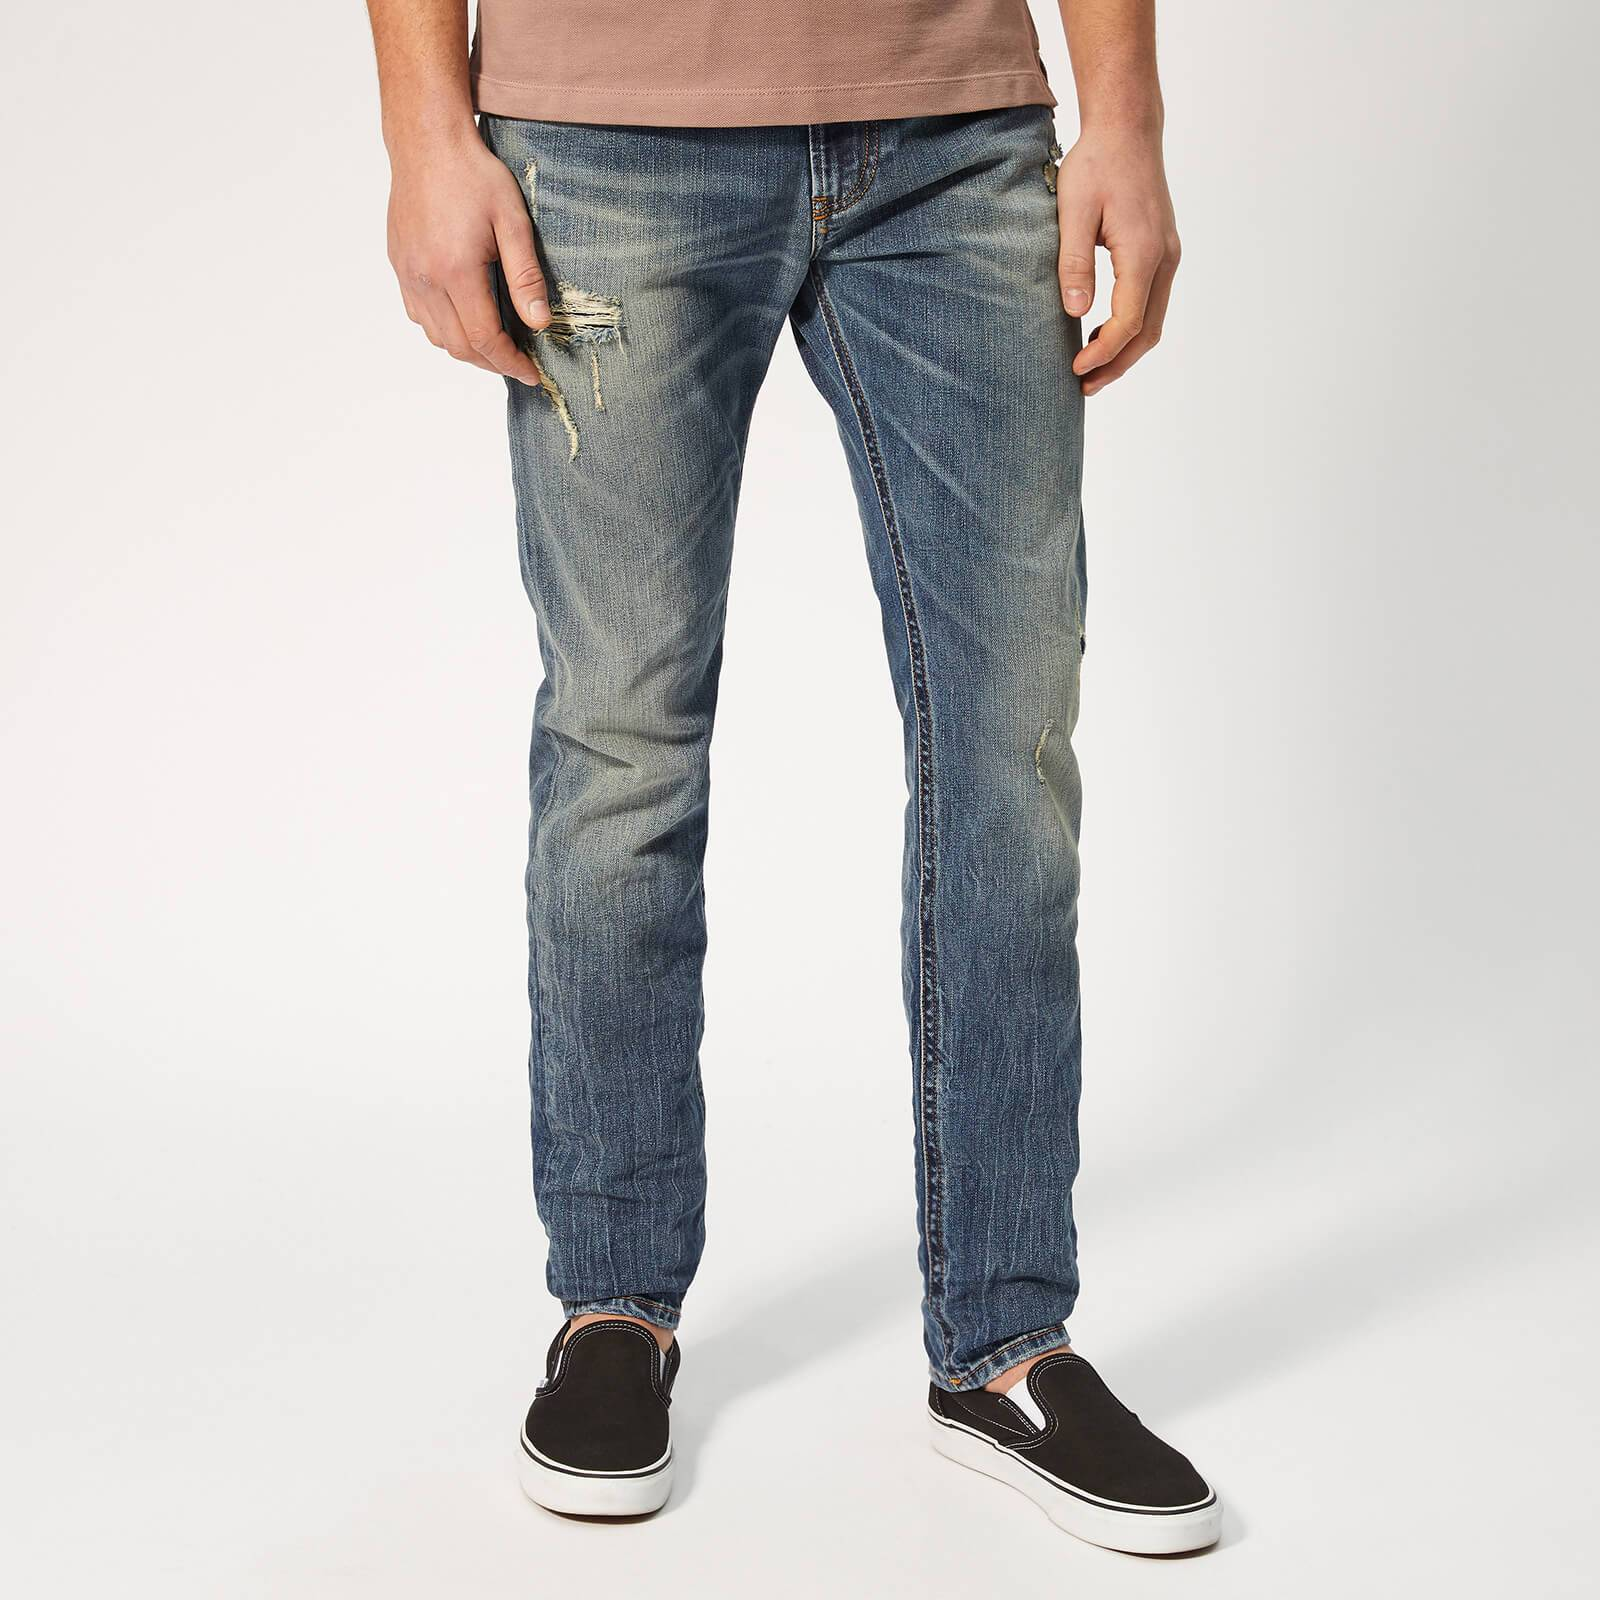 Diesel Men's Thommer Skinny Jeans - Blue - W34/L32 - Blue